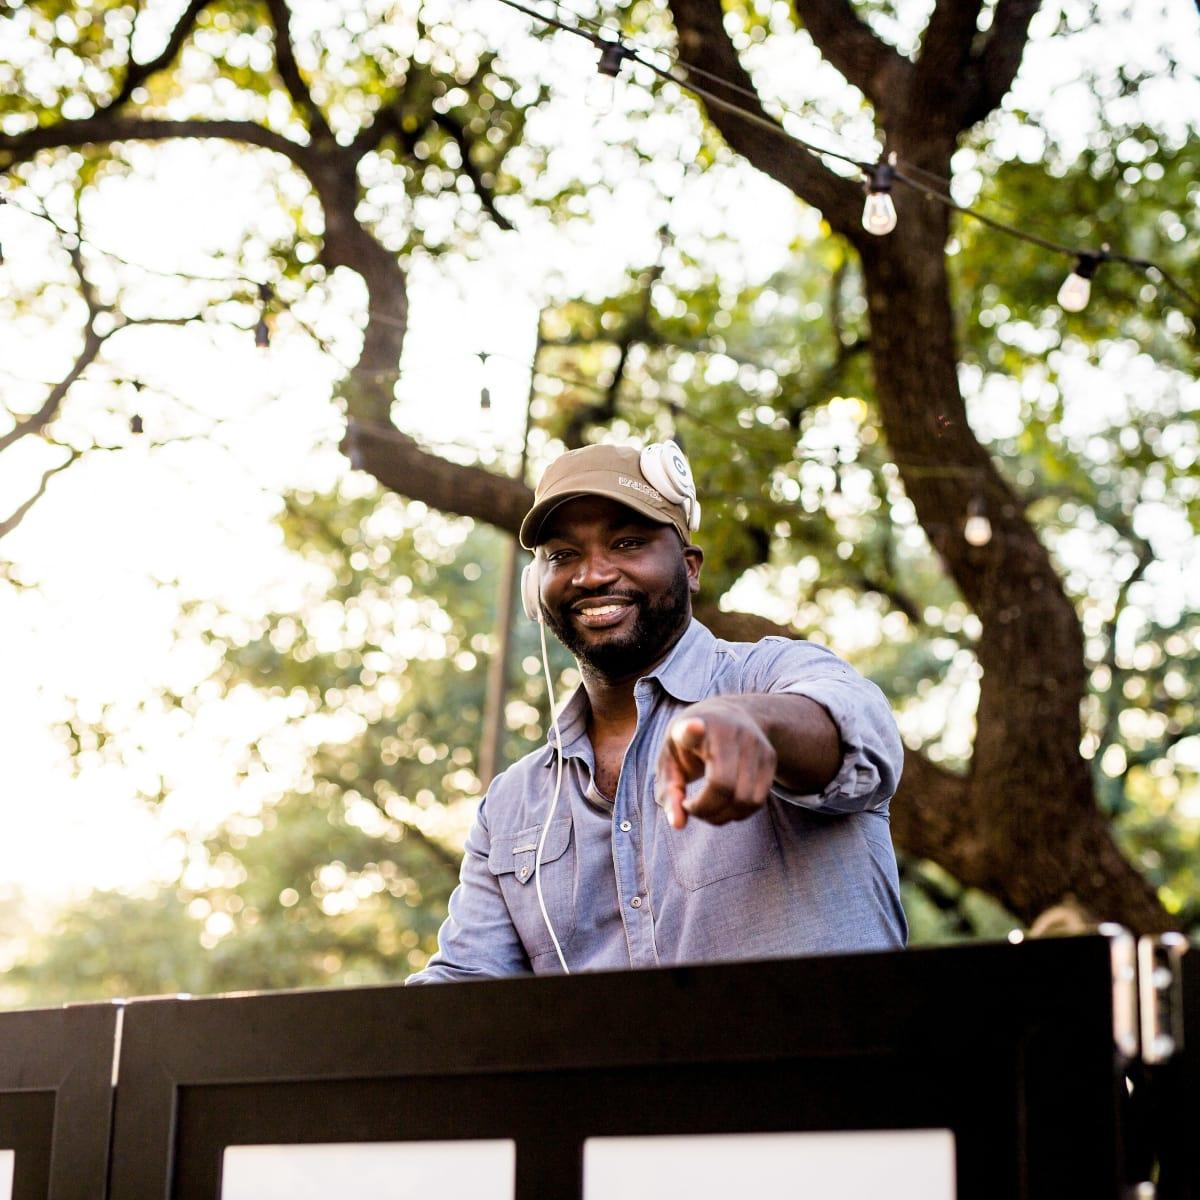 Houston, SportsMap launch party, October 2017, DJ Senega